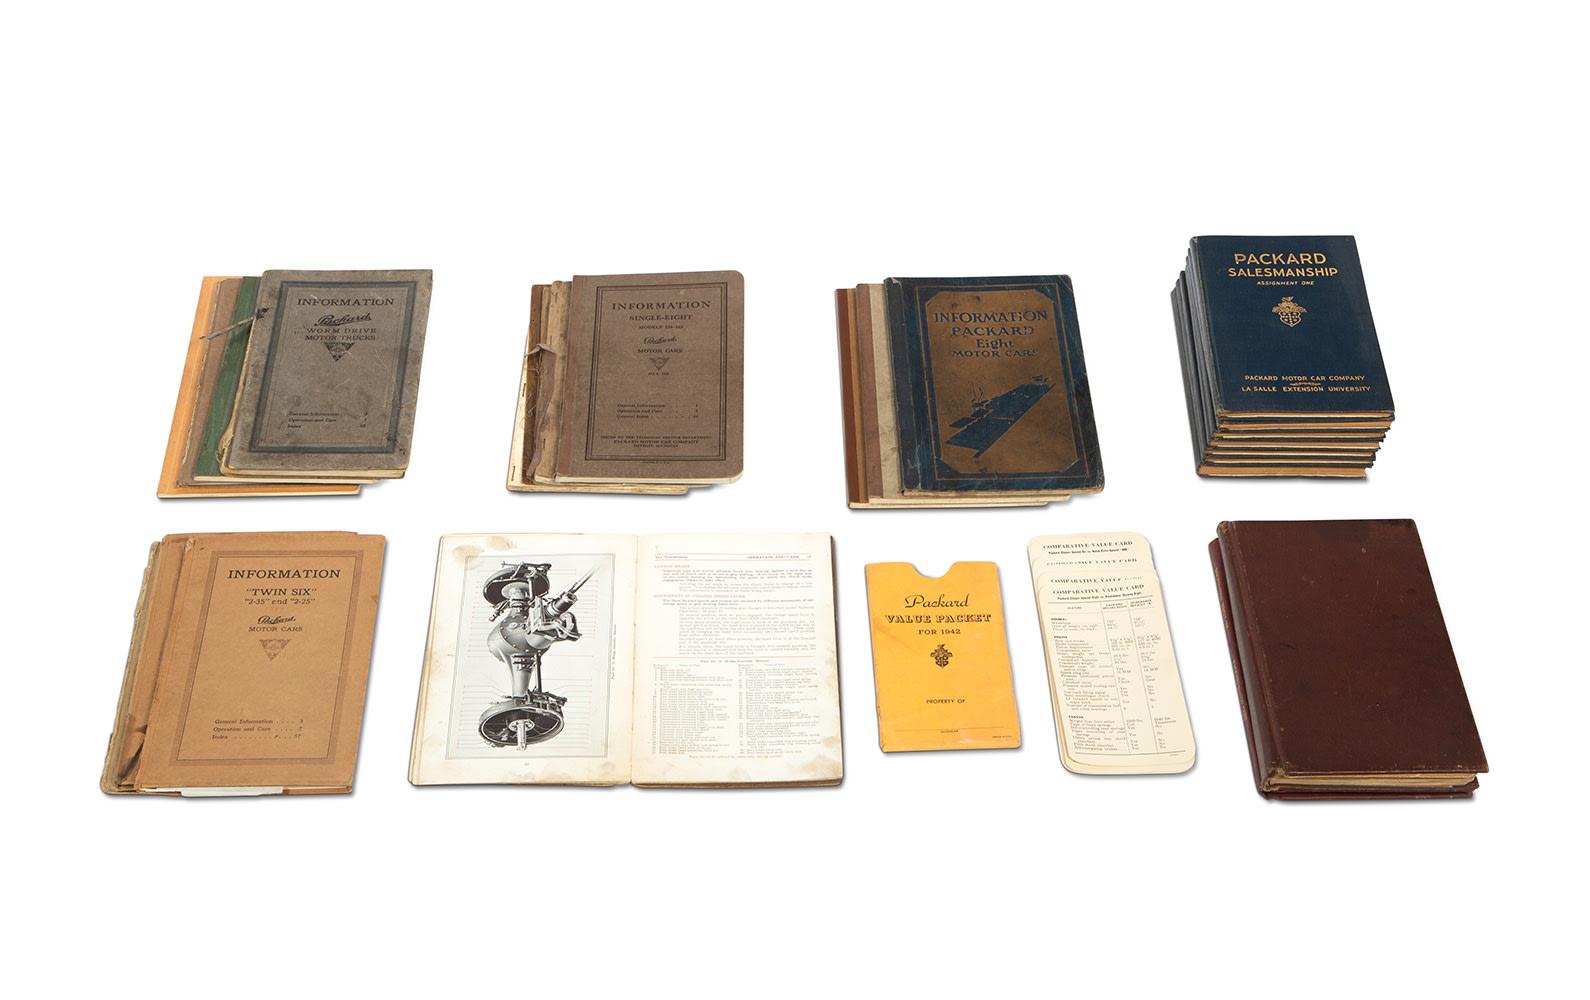 Assorted Packard Salesmanship Literature and Model Information Books, c. 1907–1947